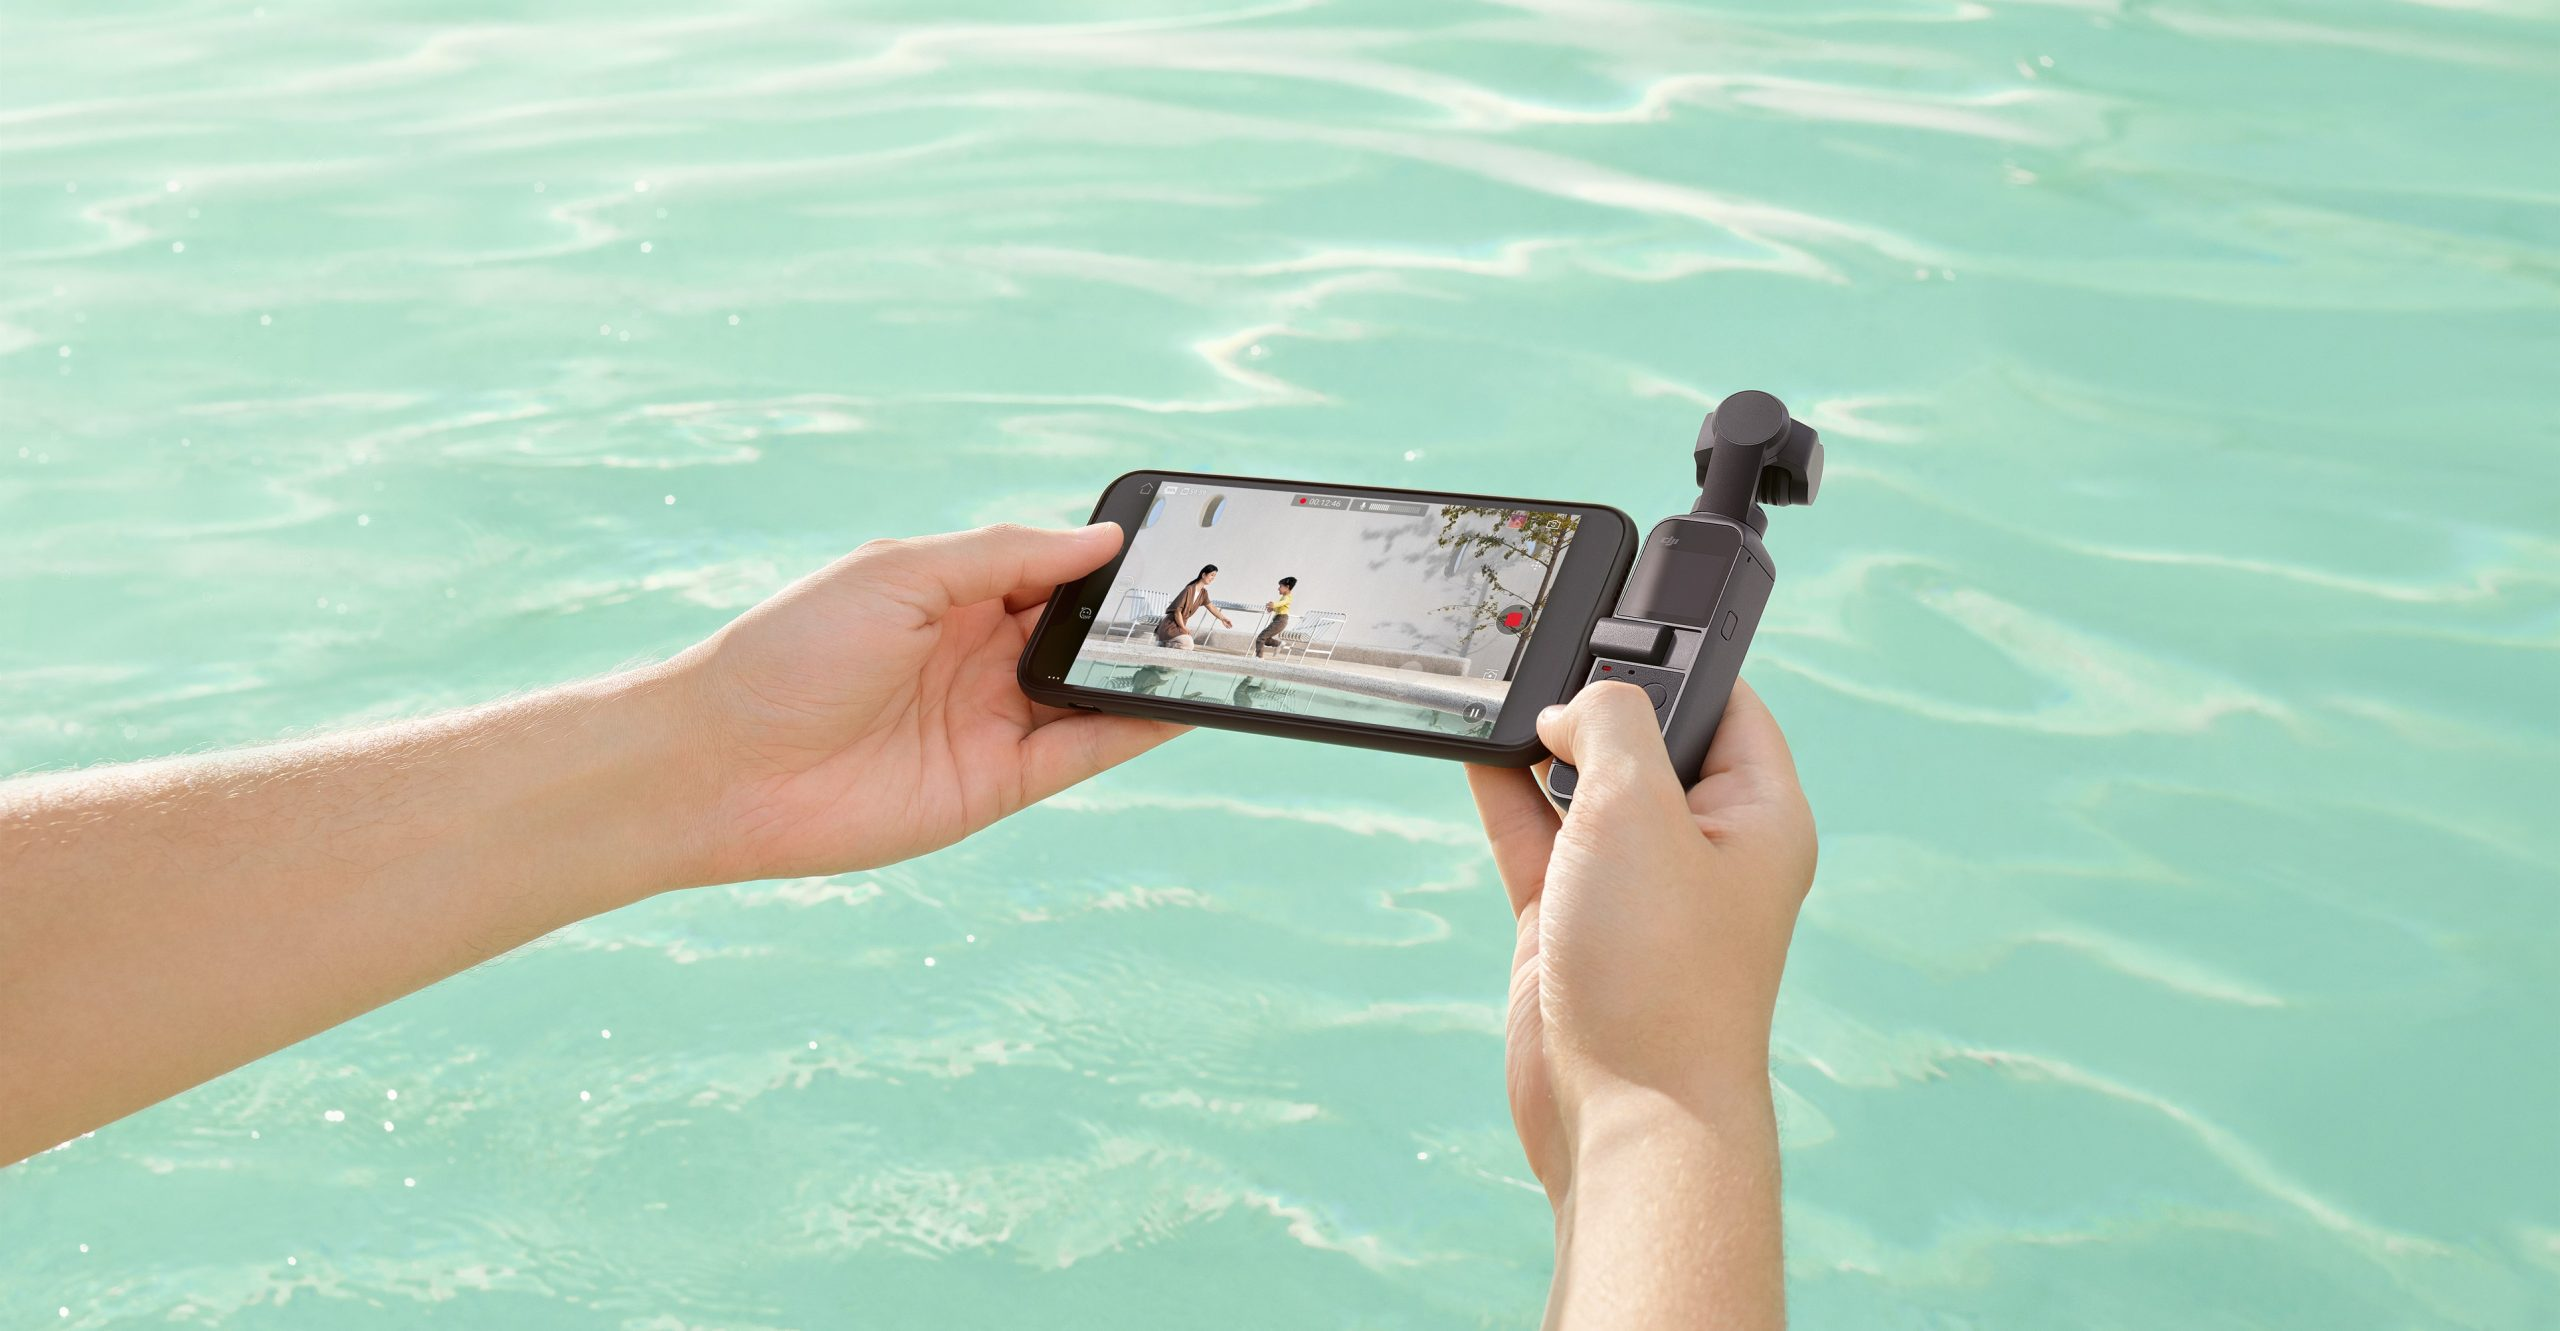 DJI Pocket 2 compact camera.jpg